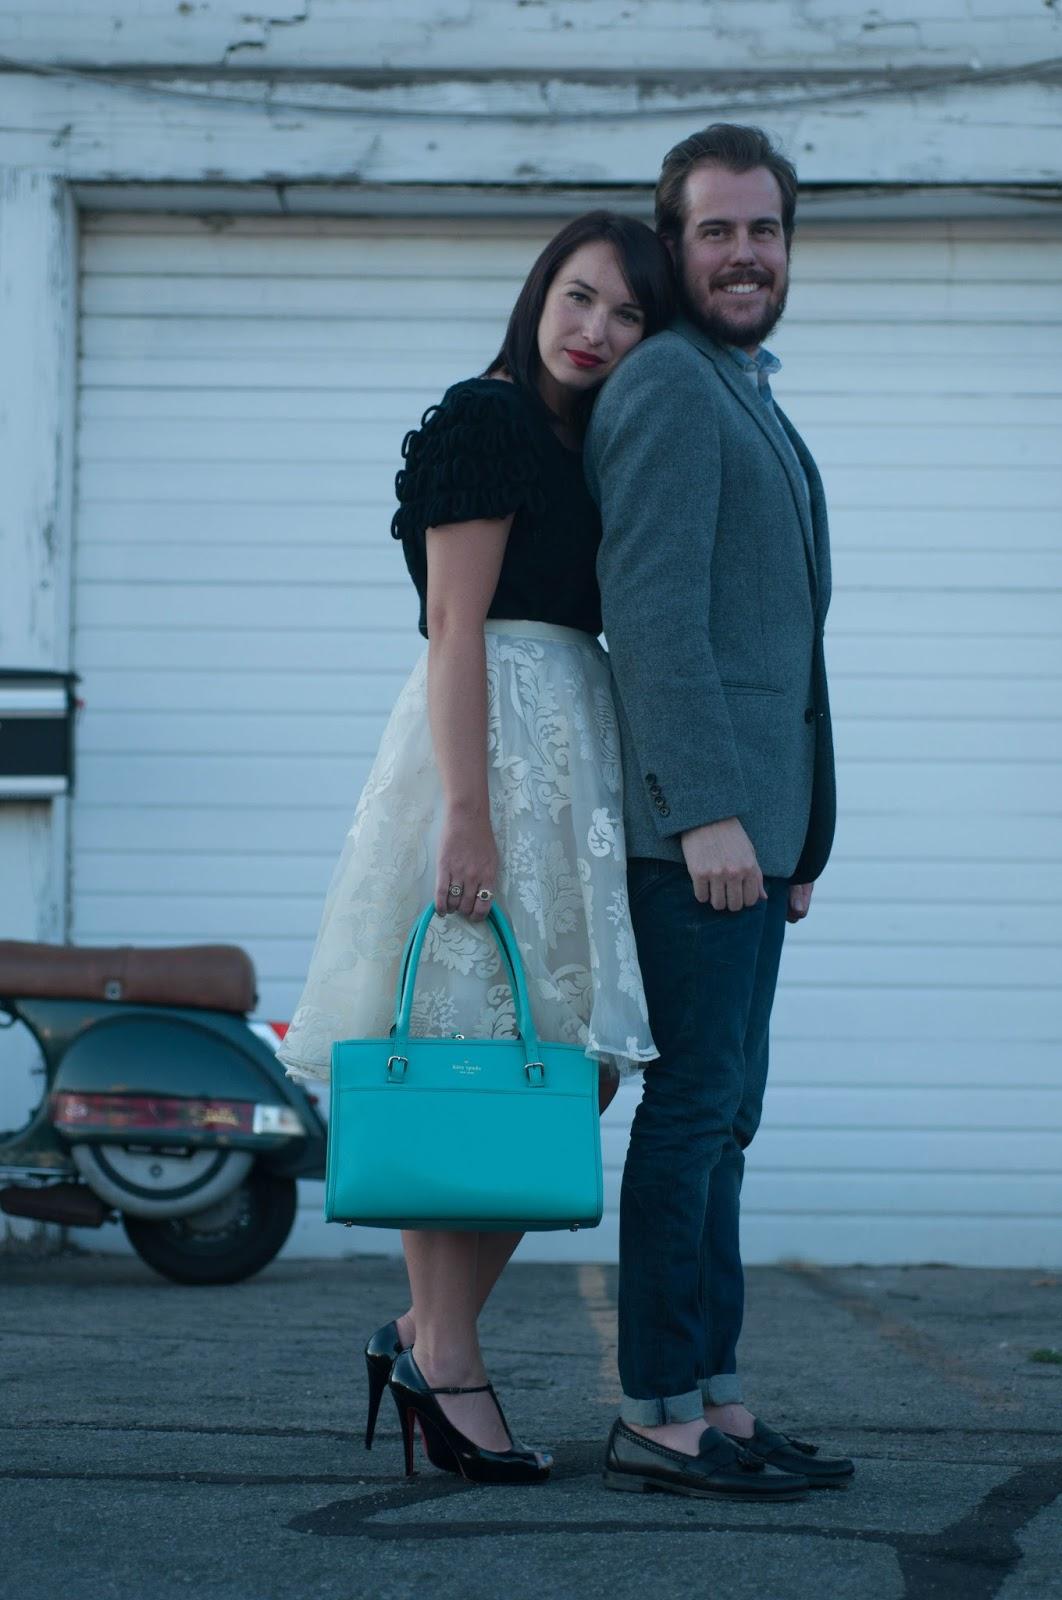 couples fashion, couples style, anthropologie ootd, kate spade handbag, wiw, kelsey bang